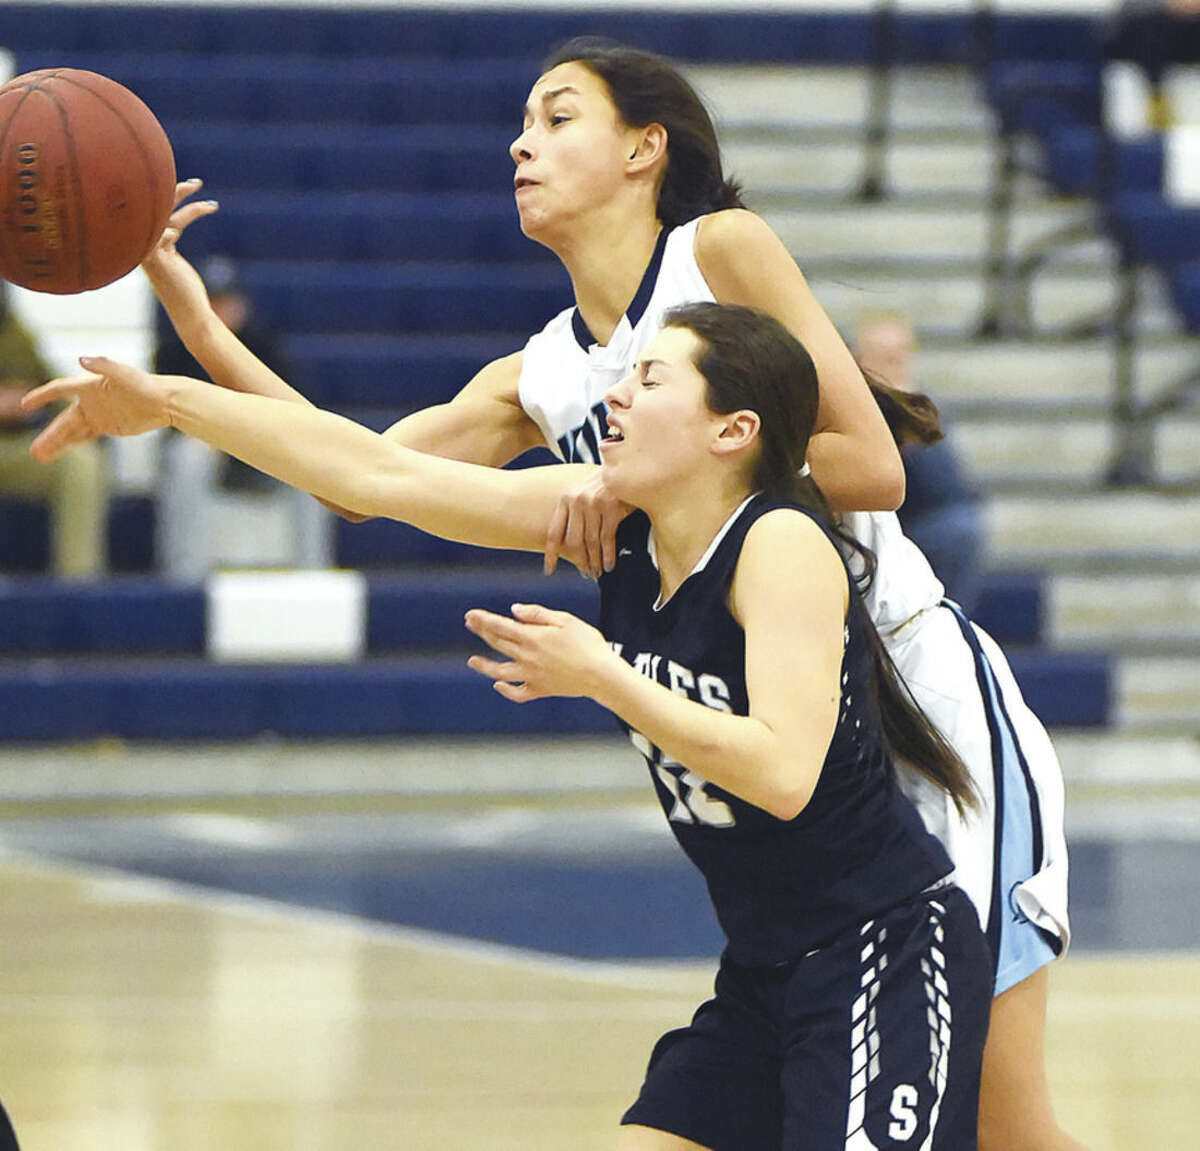 Girls Basketball: Wilton tops Staples, qualifies for FCIAC playoffs